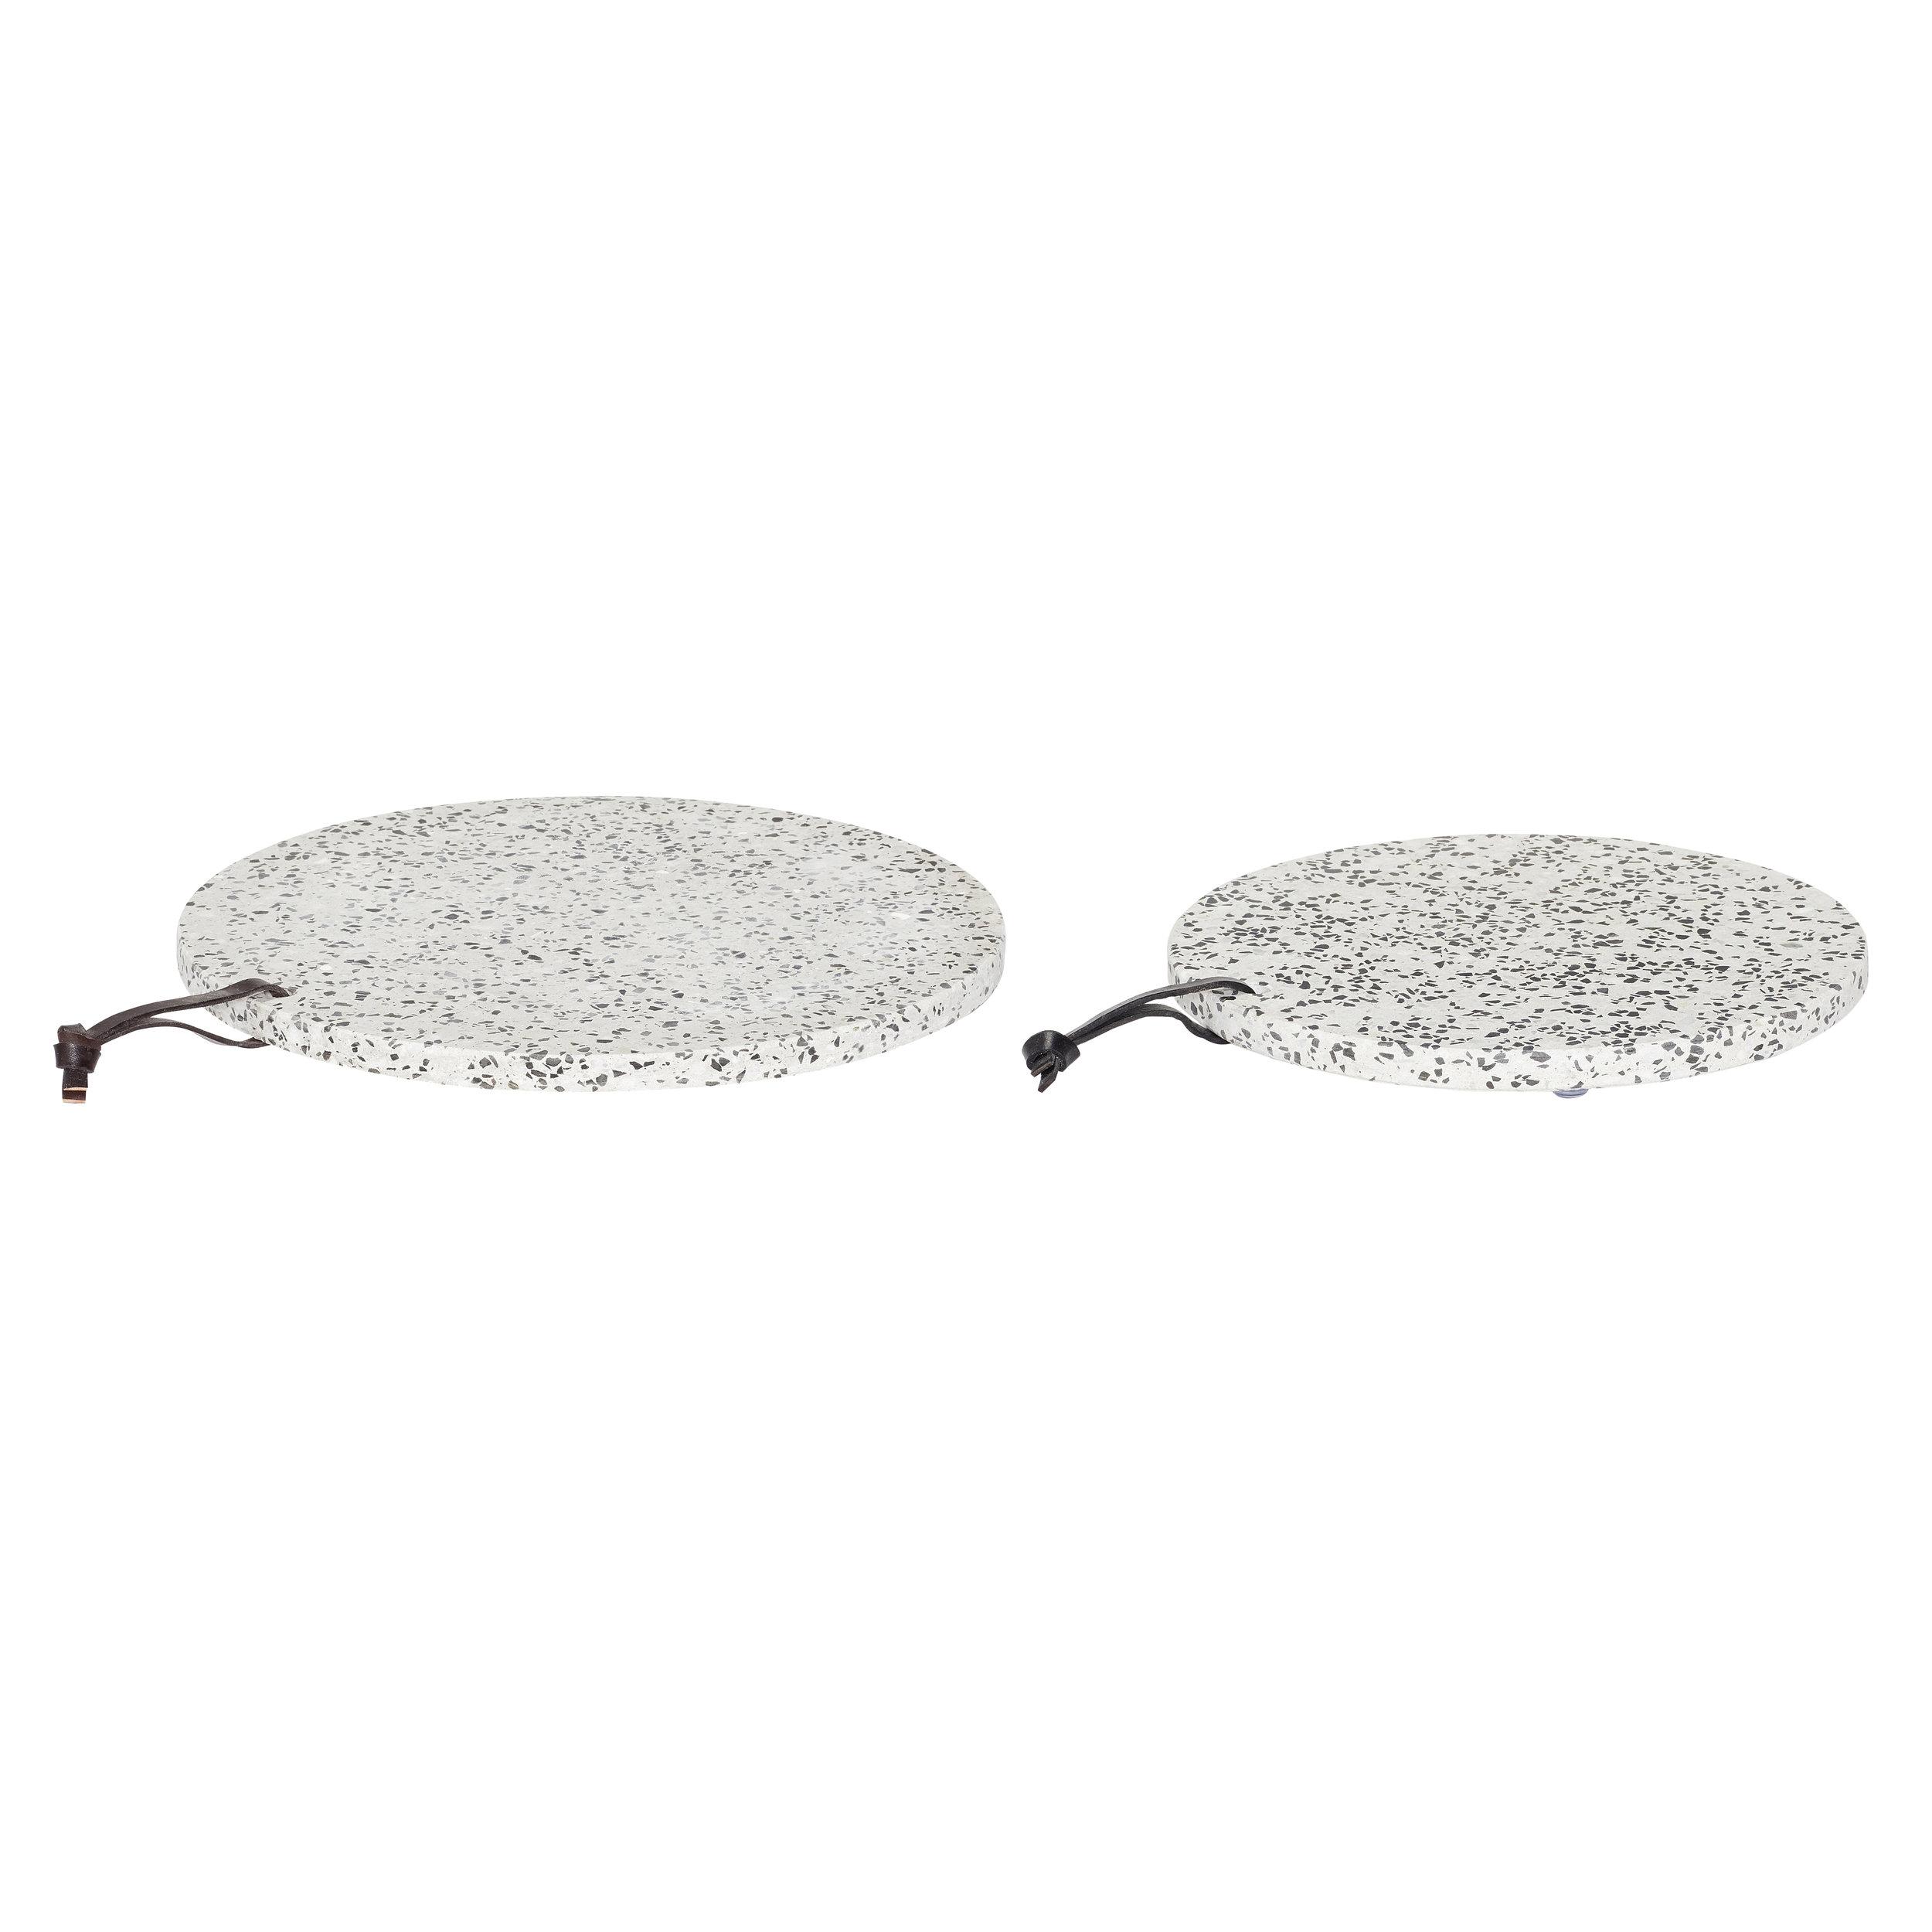 #015 Grey Terrazzo Serving Board   25cmxH2cm,30cmxH2cm Hire Price - £7.50 Minimum Order 3 per set Current Stock Available 12 per set